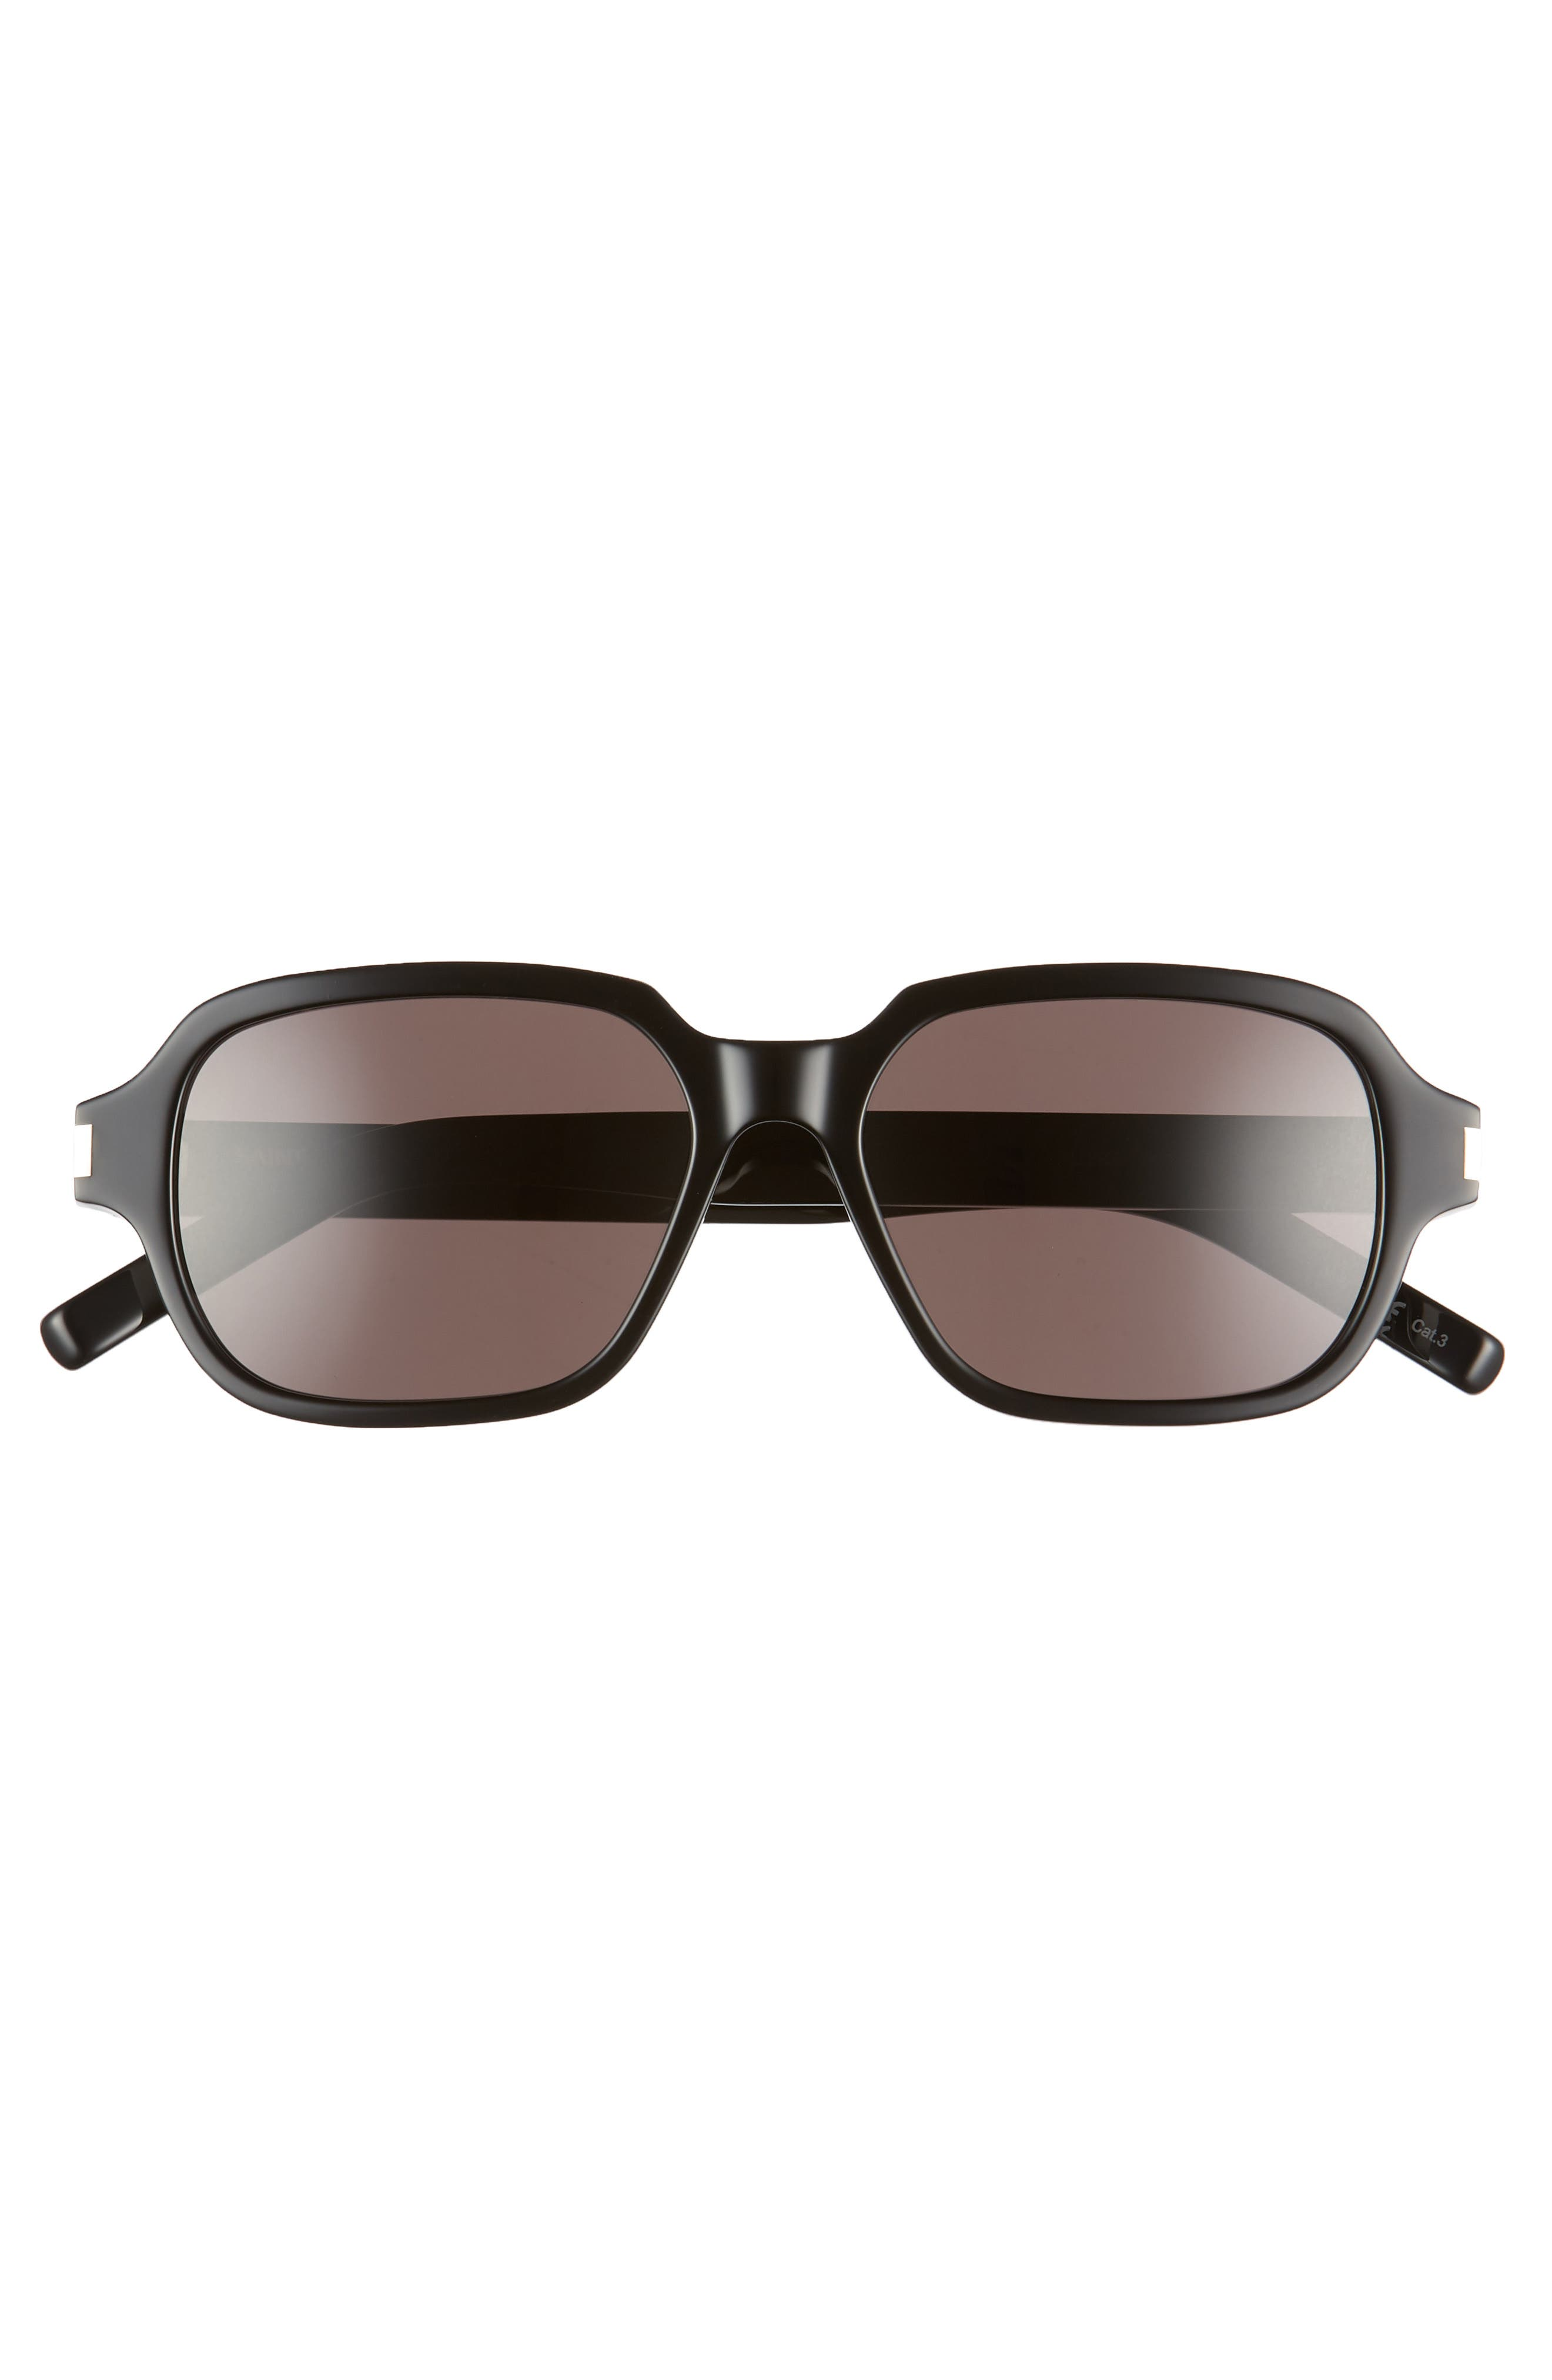 SAINT LAURENT, 53mm Rectangle Sunglasses, Alternate thumbnail 3, color, SHINY BLACK/ GREY SOLID